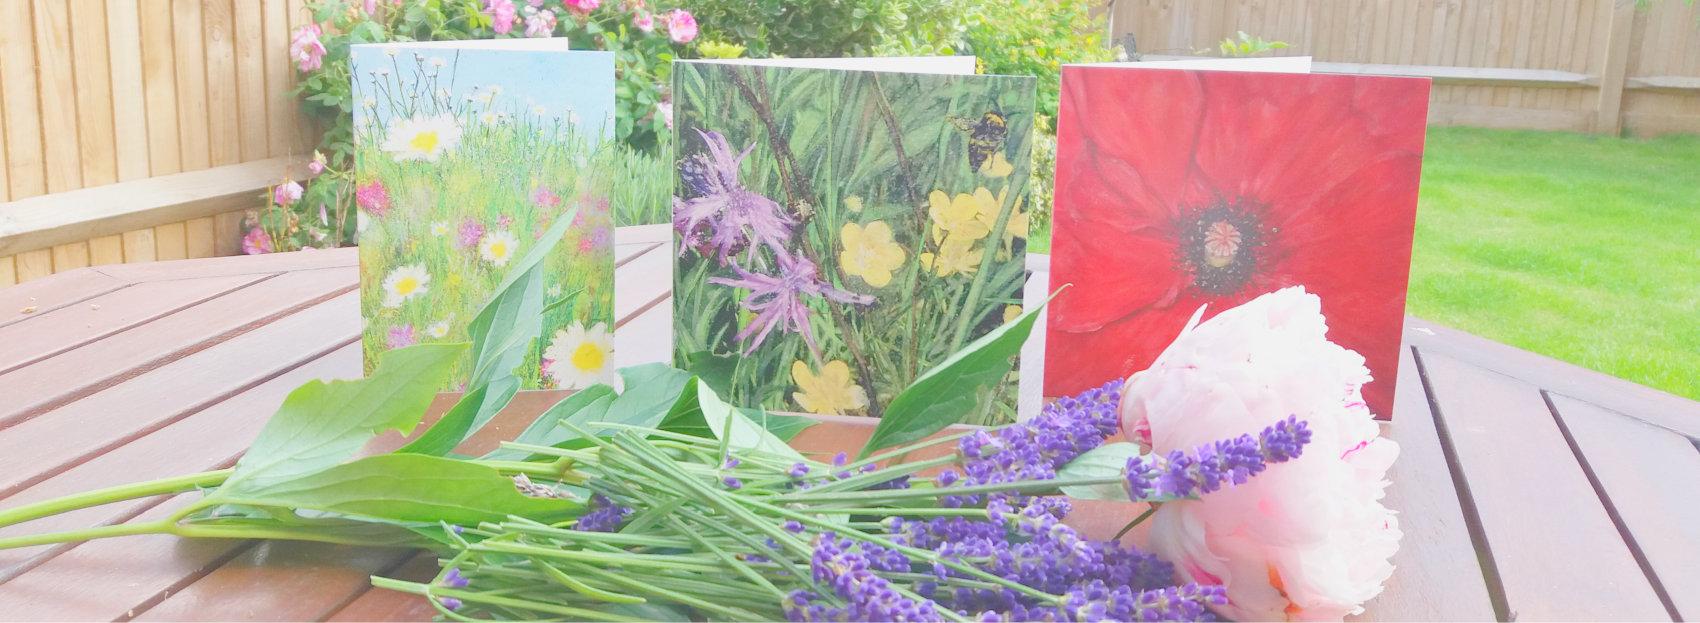 garden-seed-card-banner.jpg